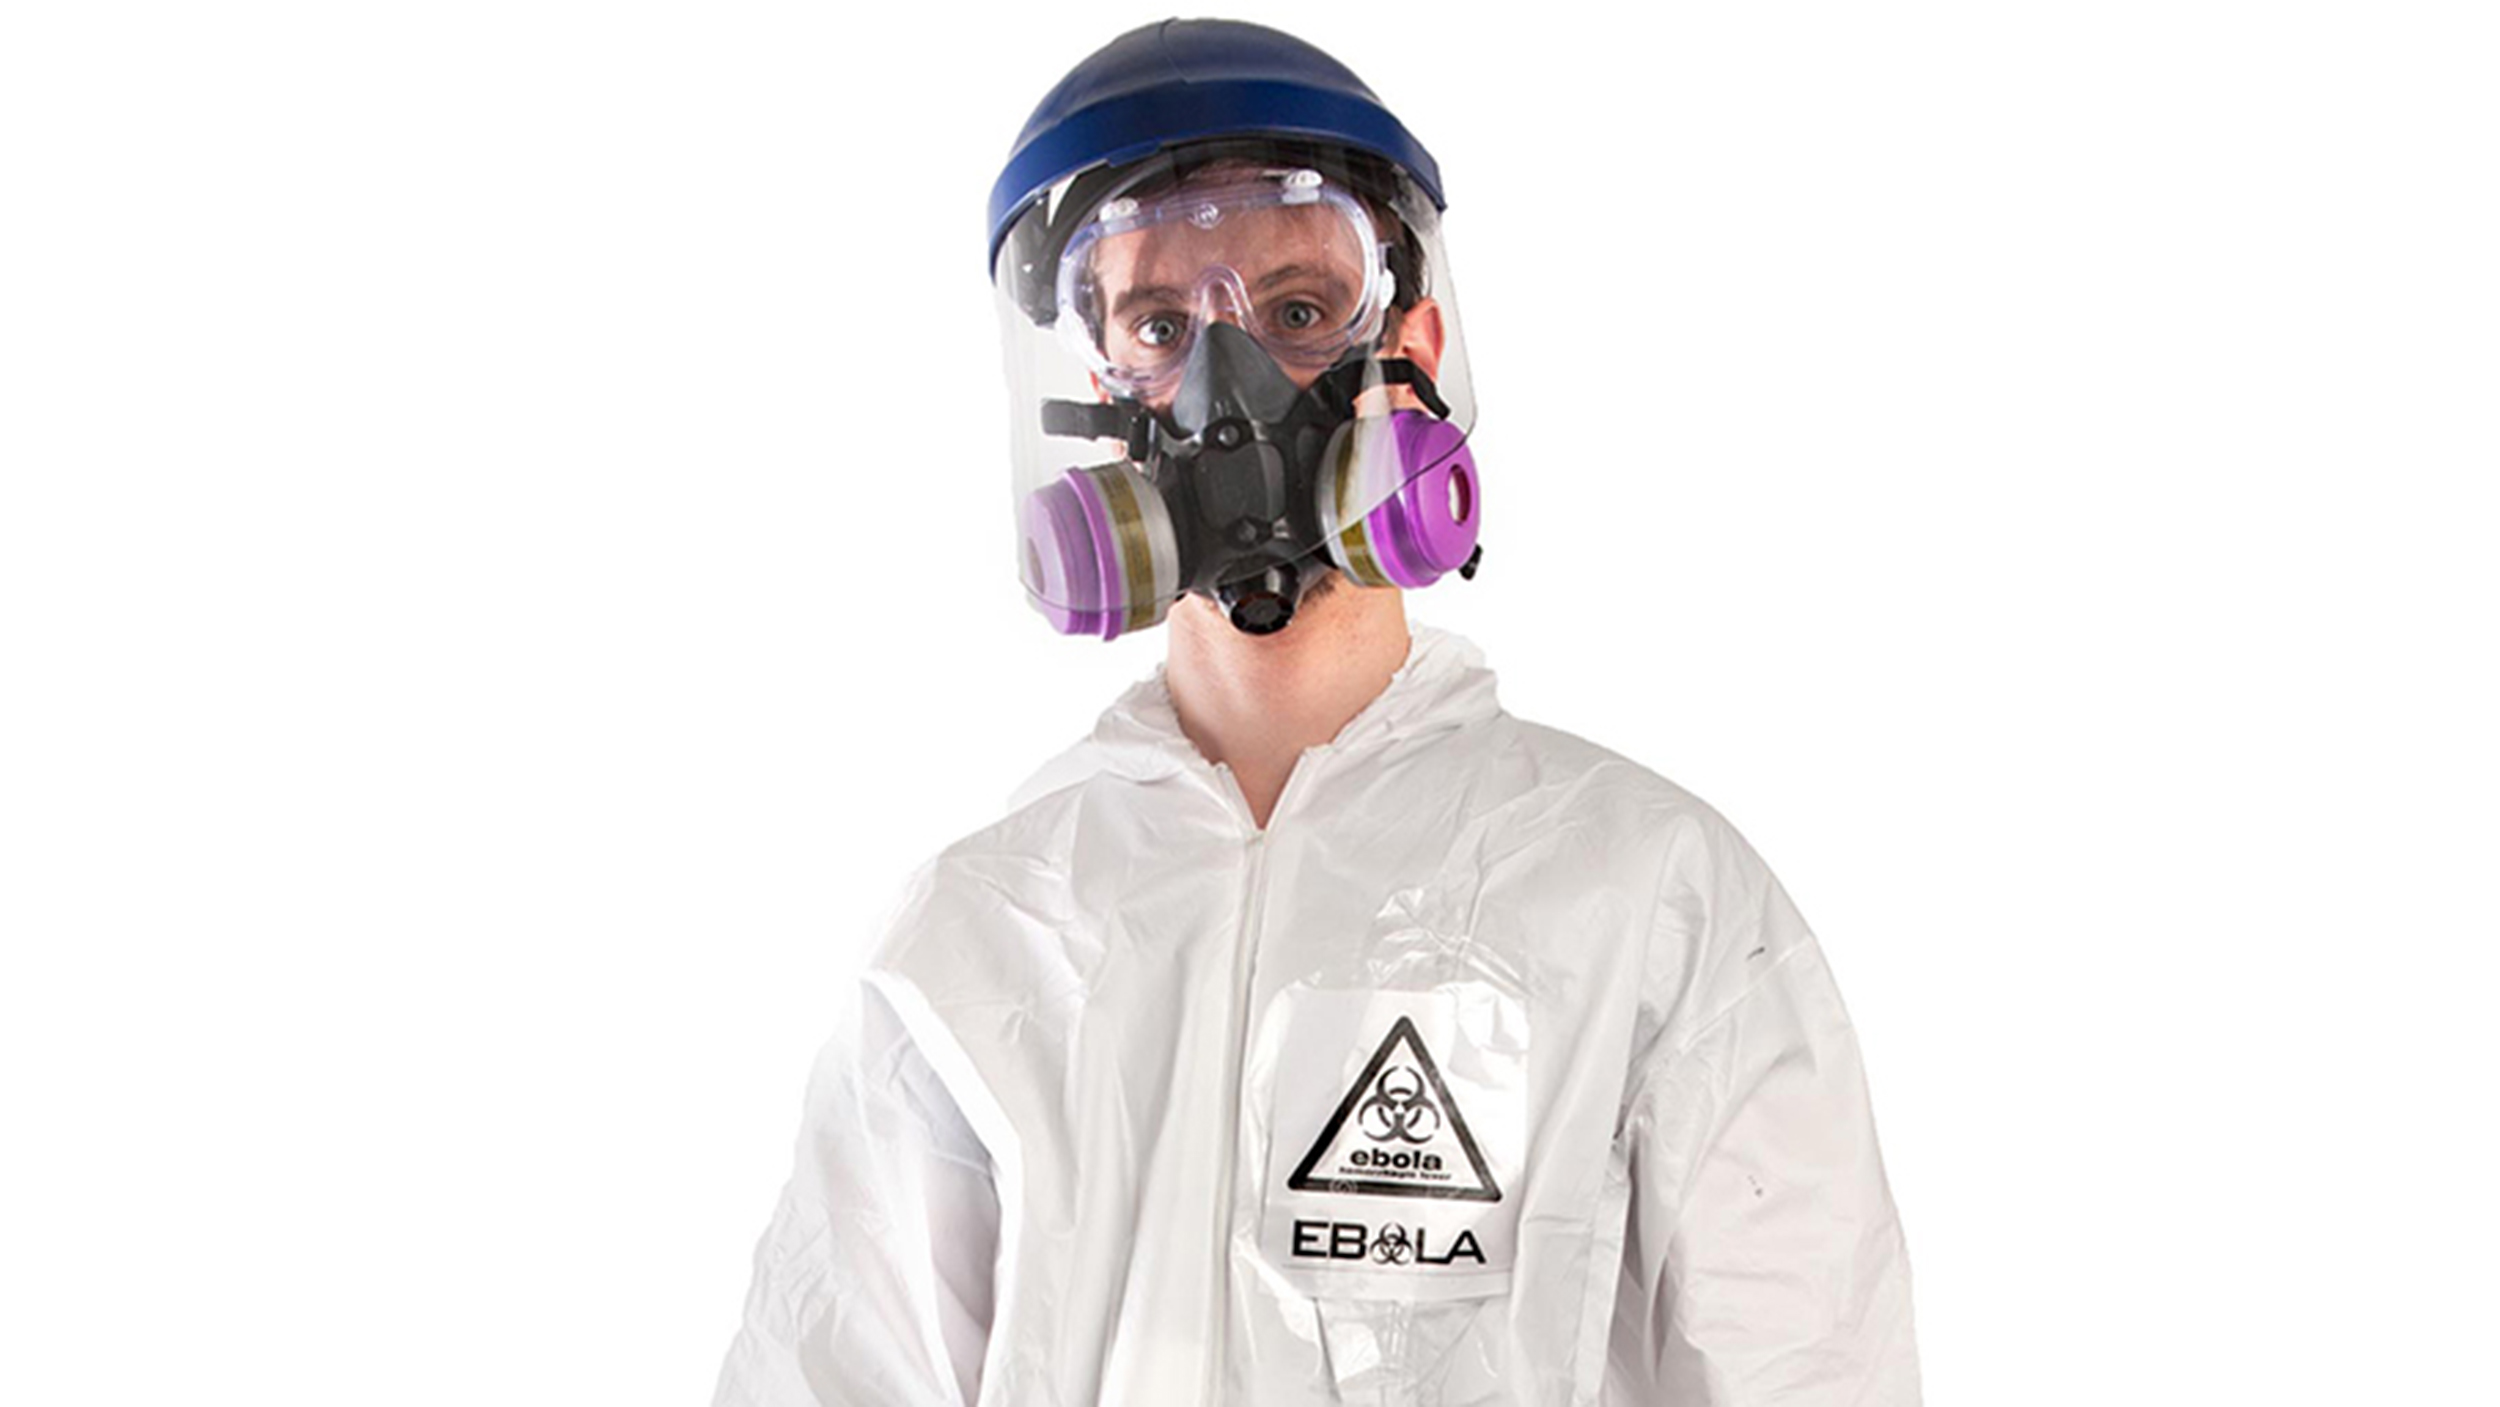 Ebola hazmat costume on sale in time for Halloween